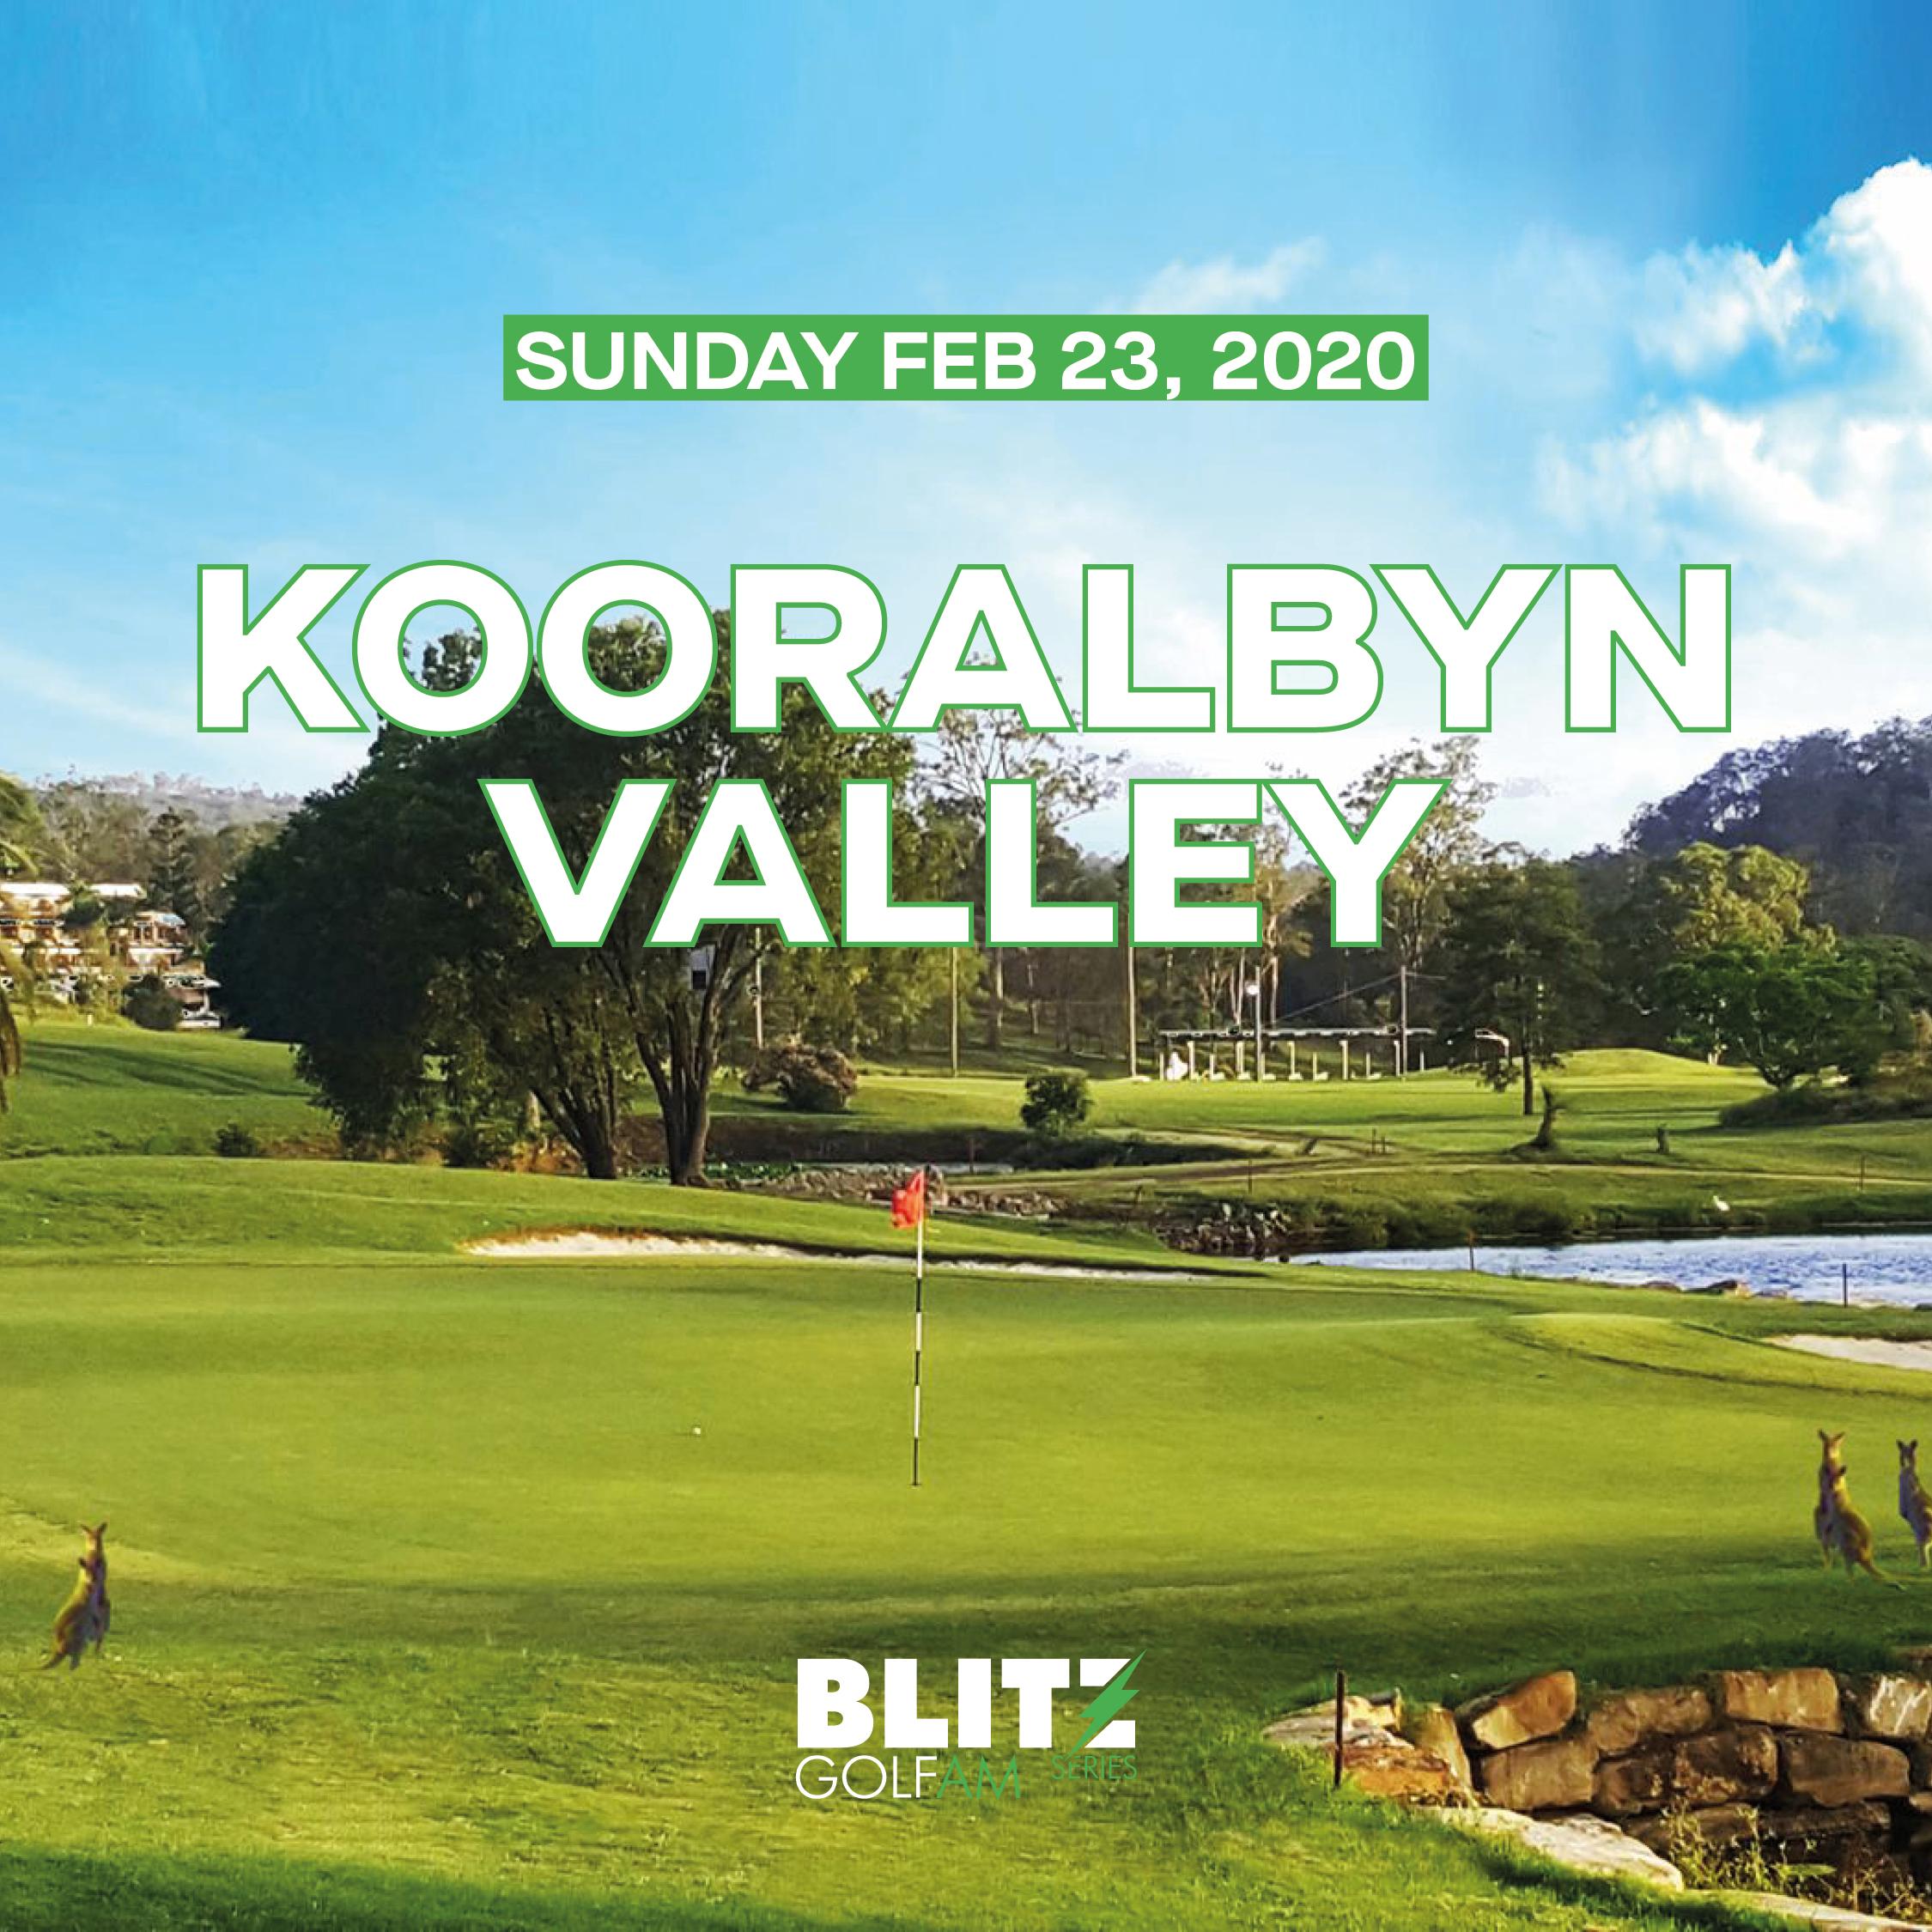 QLD_Kooralbyn Valley_Blitz 2020_AM Series Launch_230219.jpg